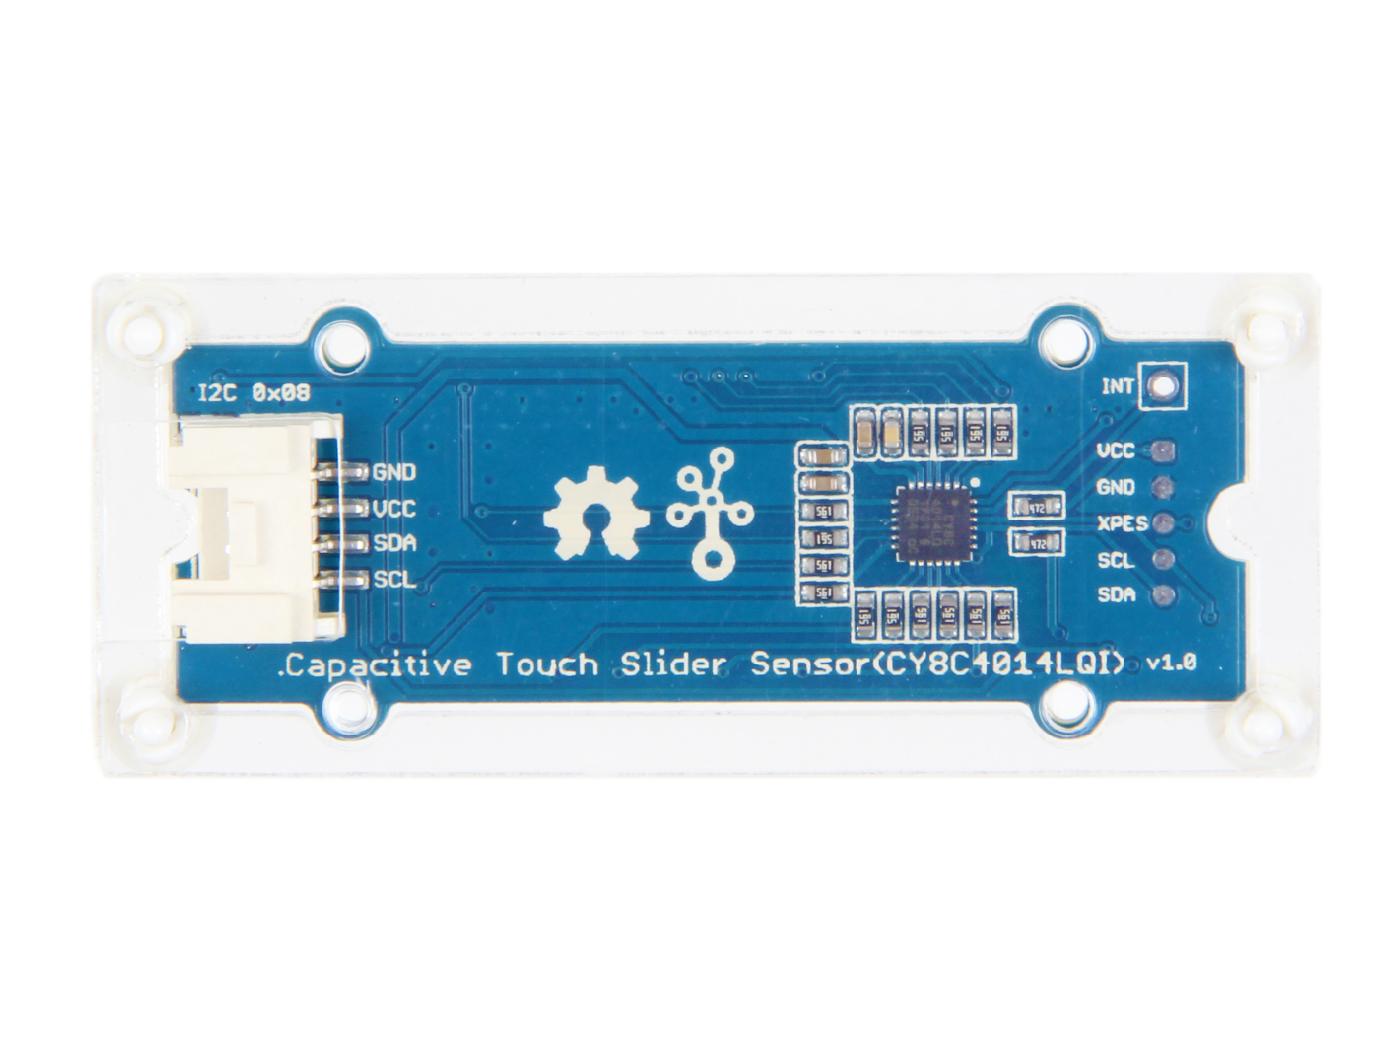 Grove - Capacitive Touch Slide Sensor(CY8C4014LQI)